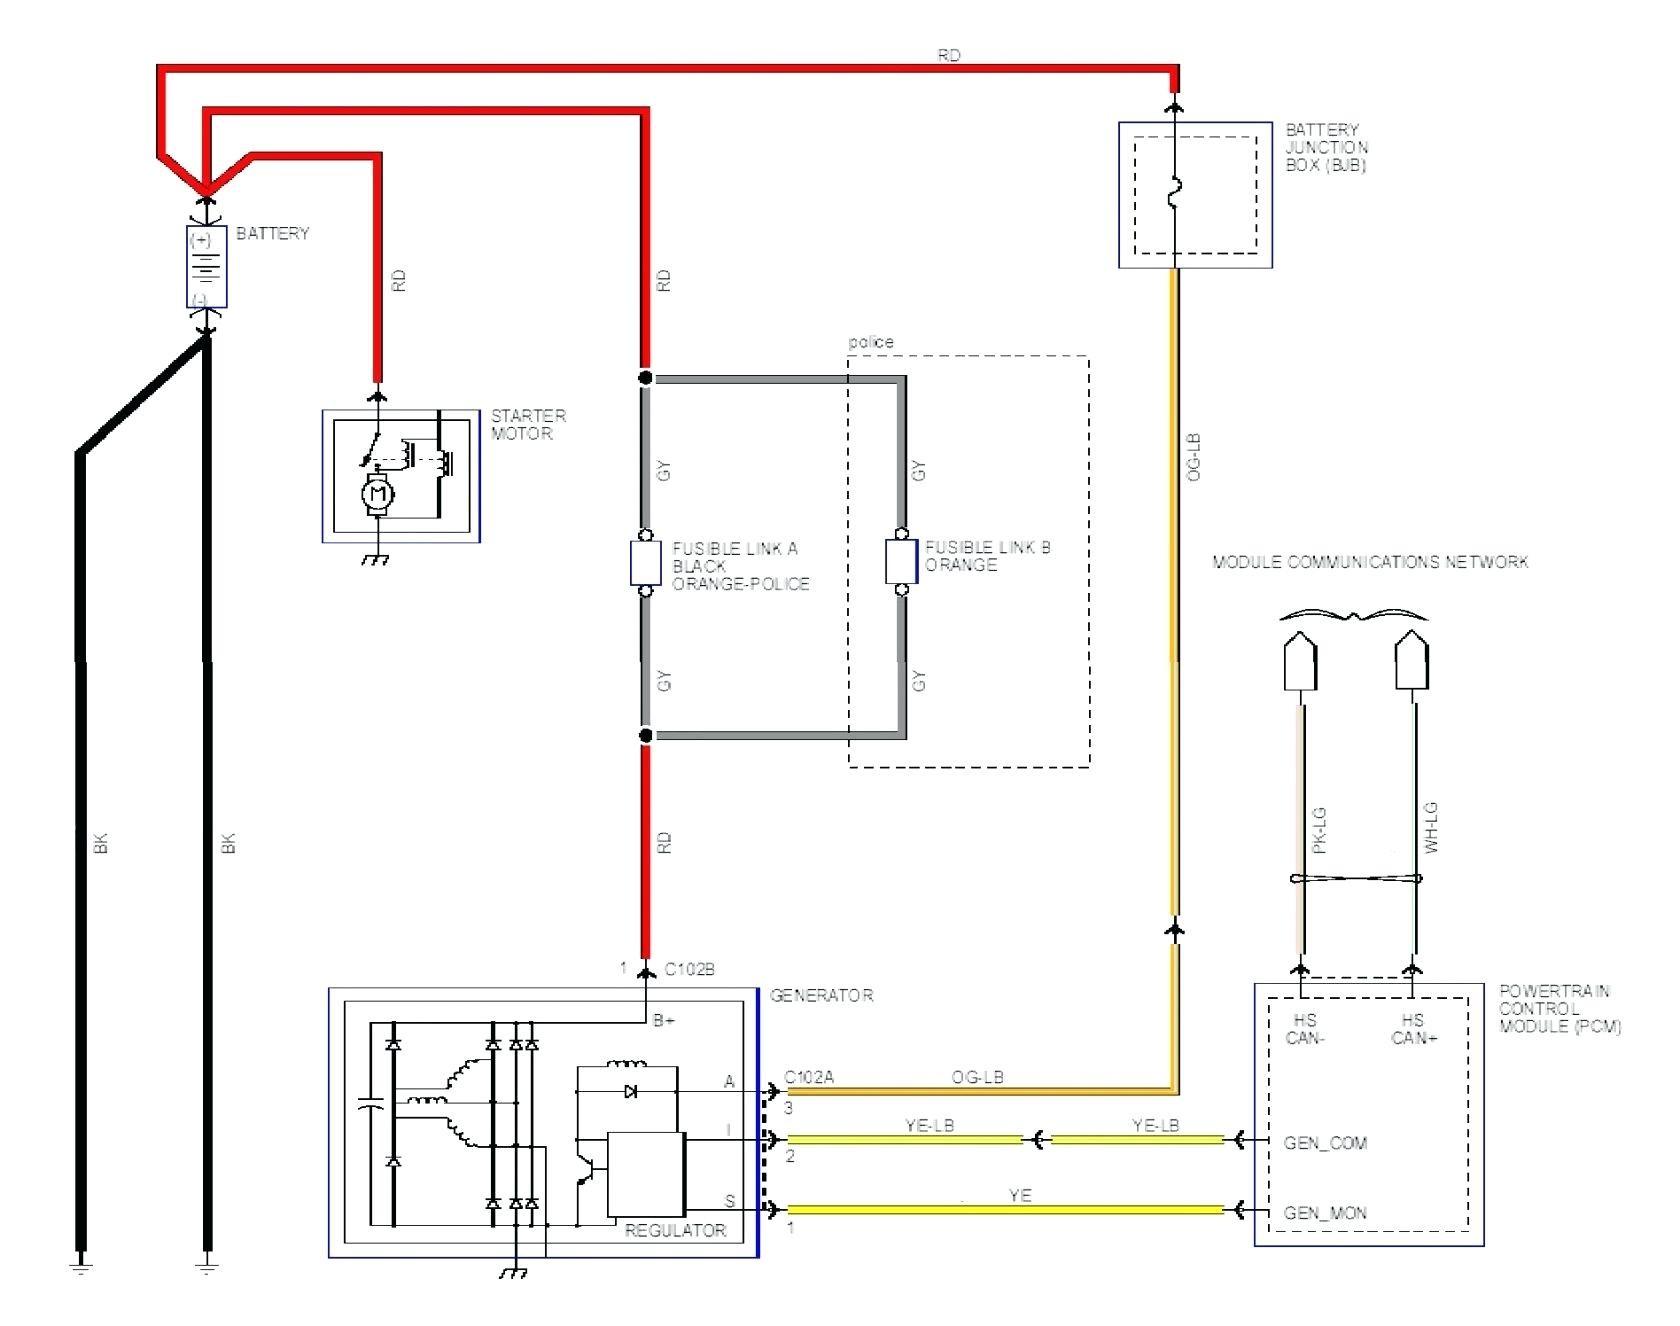 vc_2017] massey ferguson generator wiring diagram schematic wiring mf 175 wiring diagram john deere ignition switch diagram nerve ginia mohammedshrine librar wiring 101